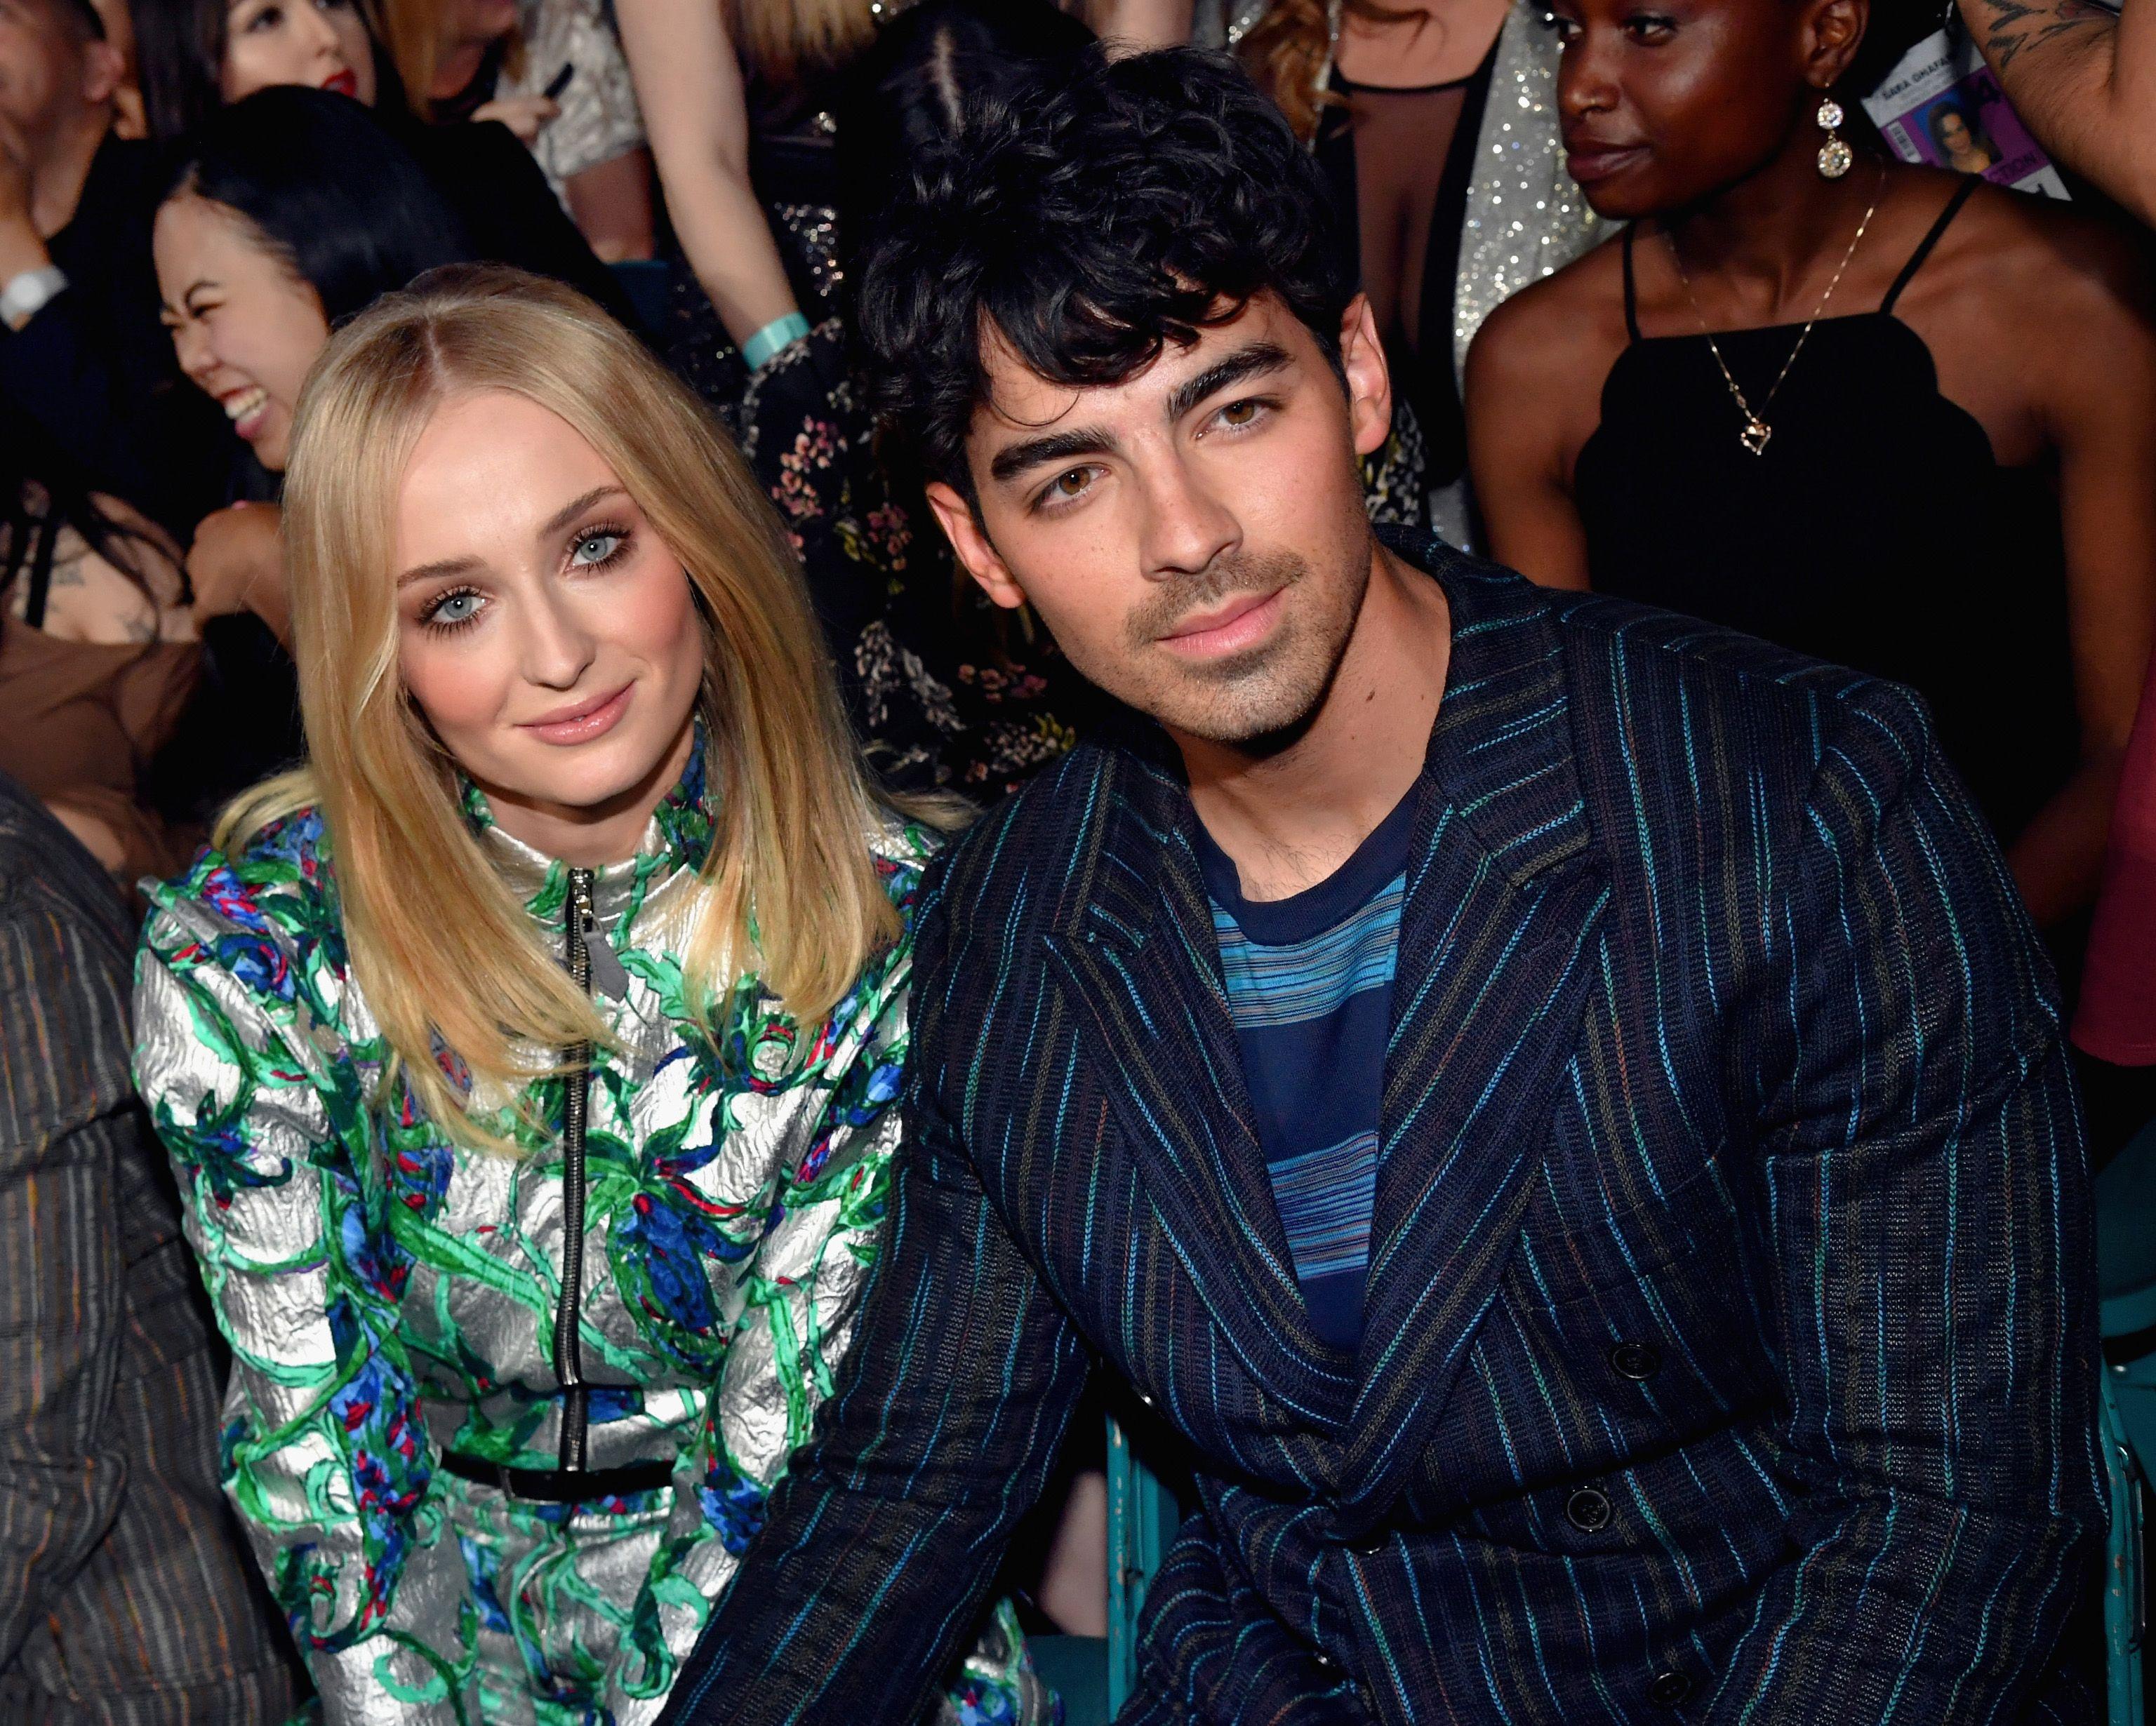 Sophie Turner and Joe Jonas sitting together.